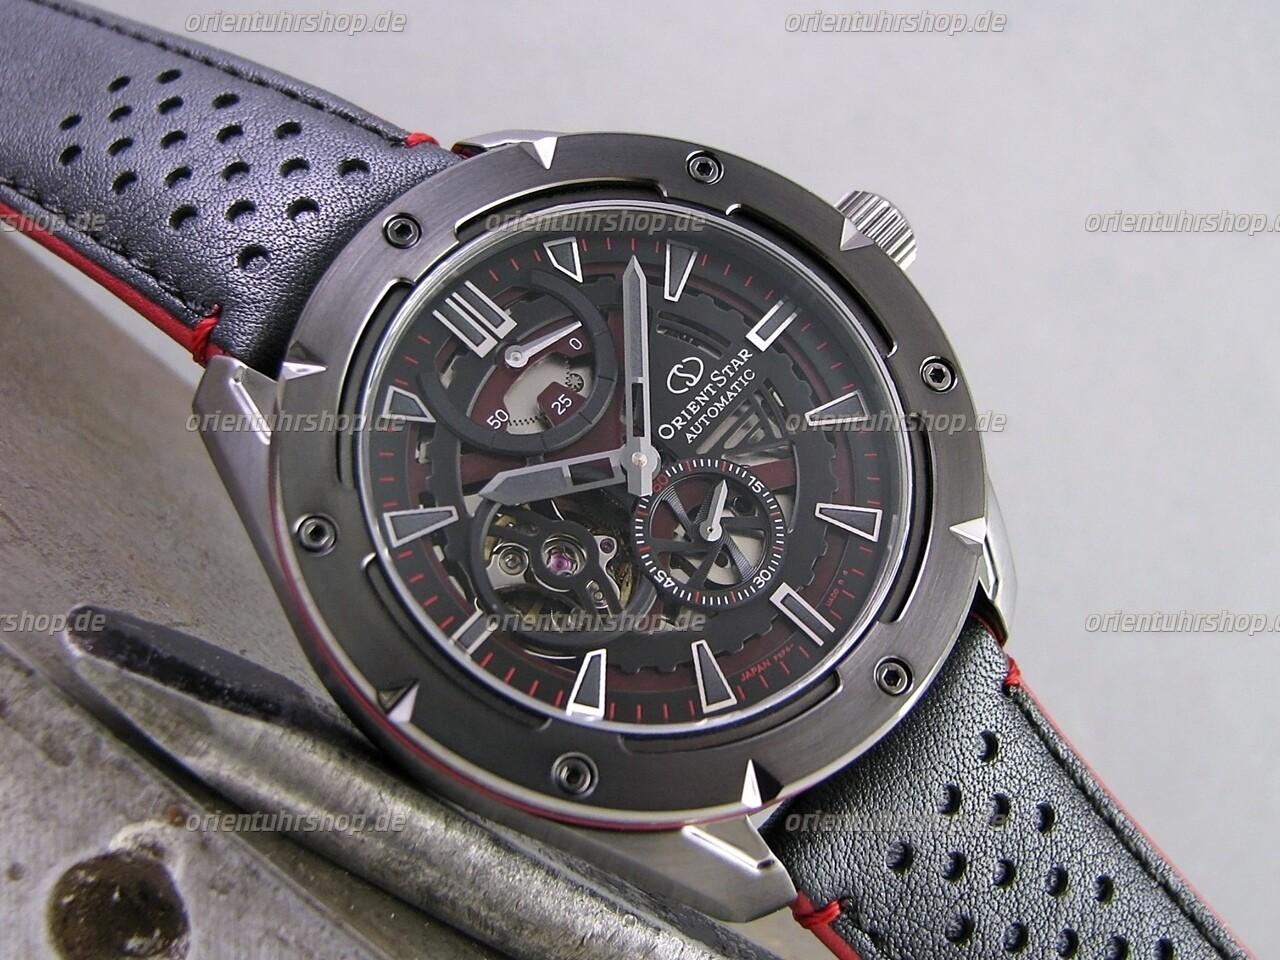 Orient Star Avant-Garde Automatik Uhr RE-AV0A03B00B